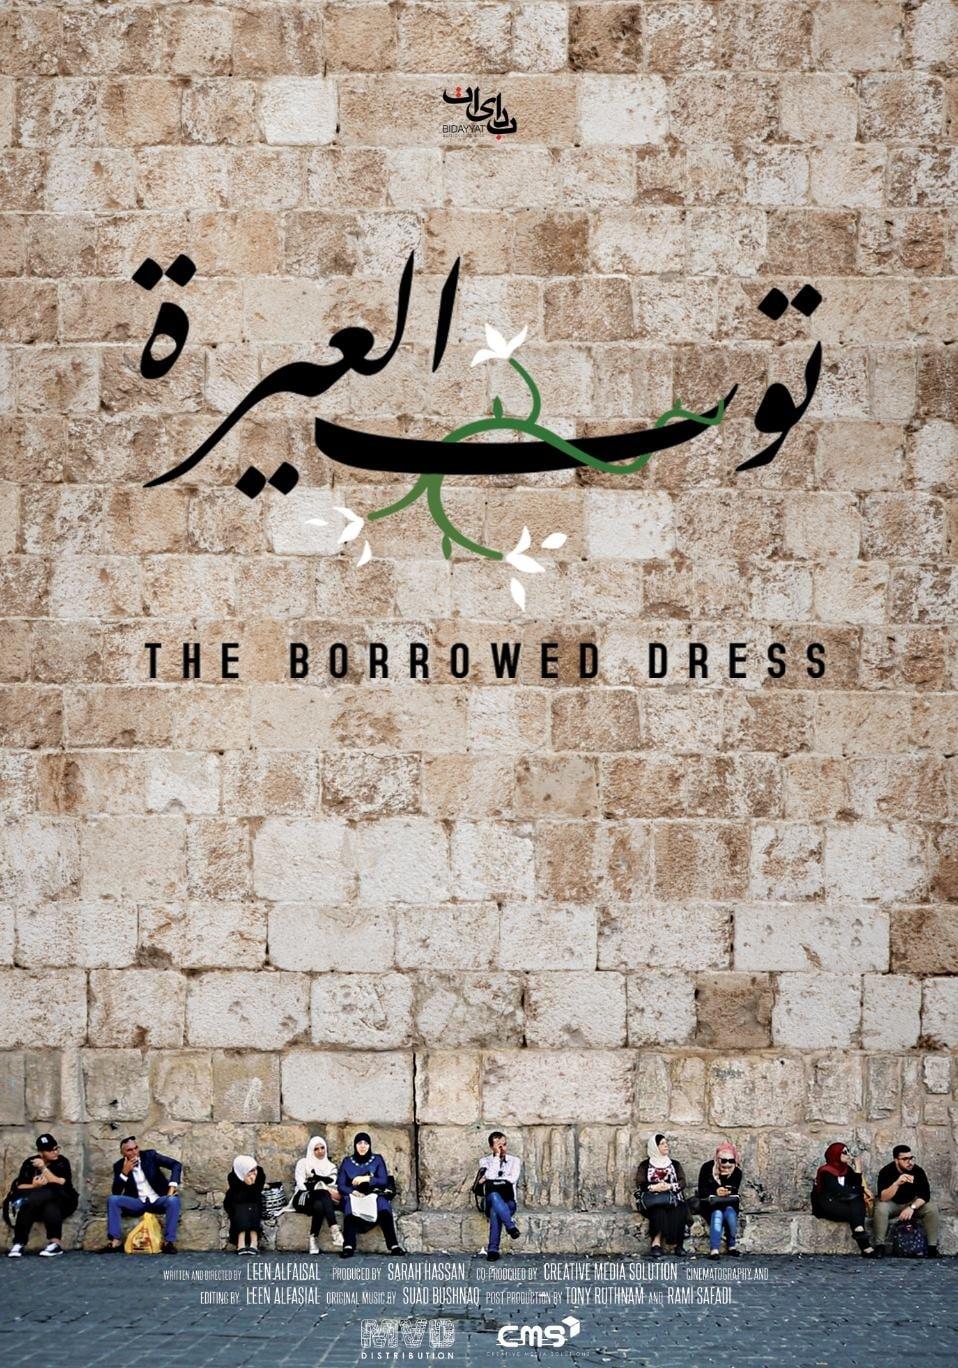 The Borrowed Dress